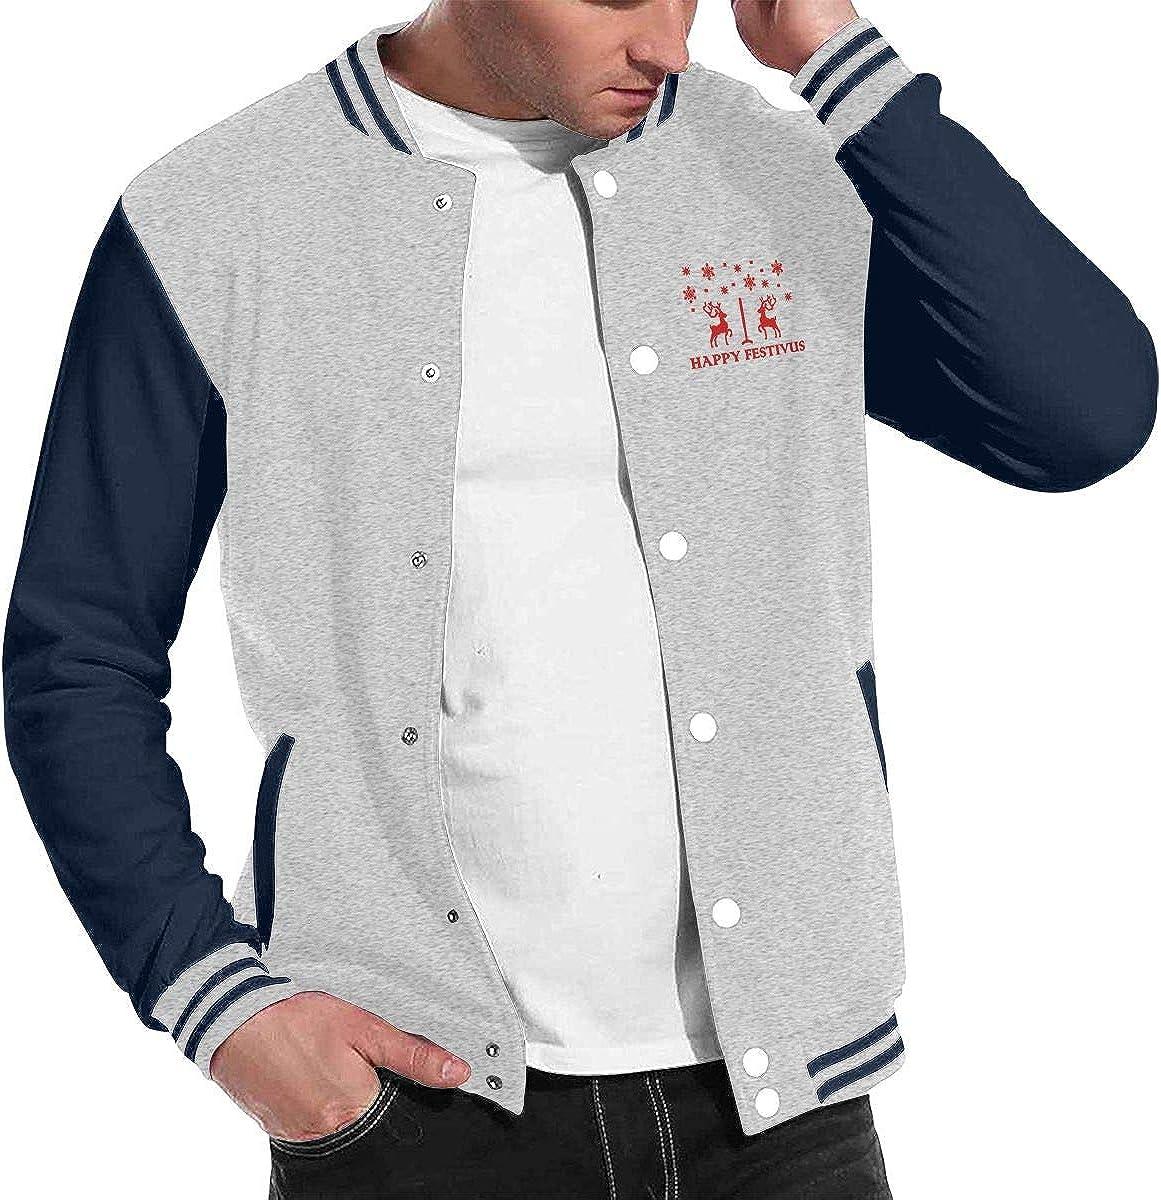 JJKKFG-H Happy Festivus Deers Mens Style Baseball Uniform Jacket Sport Coat